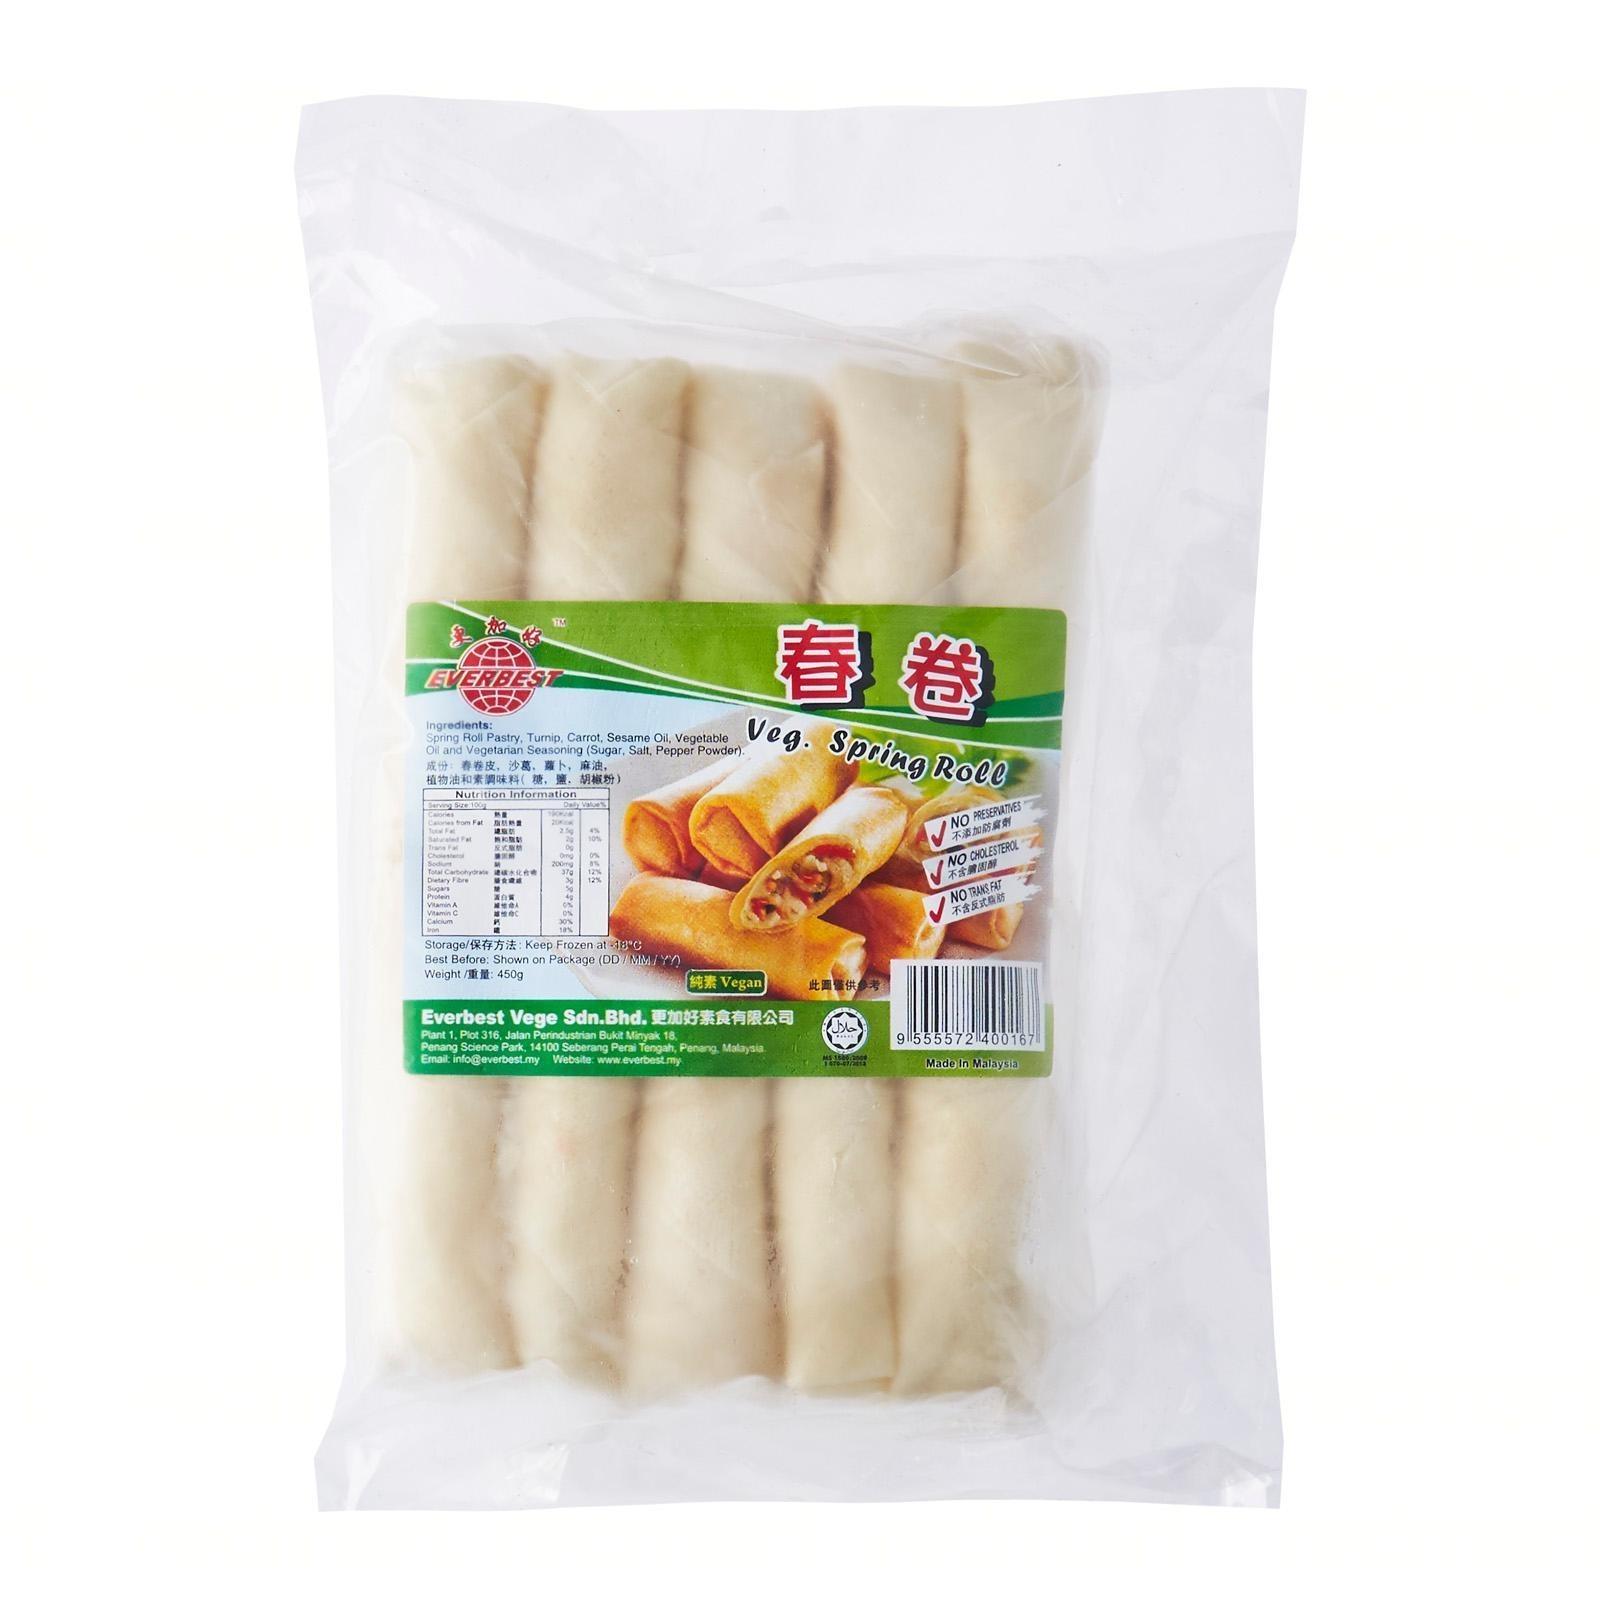 EB Frozen - Vegetarian Spring Roll